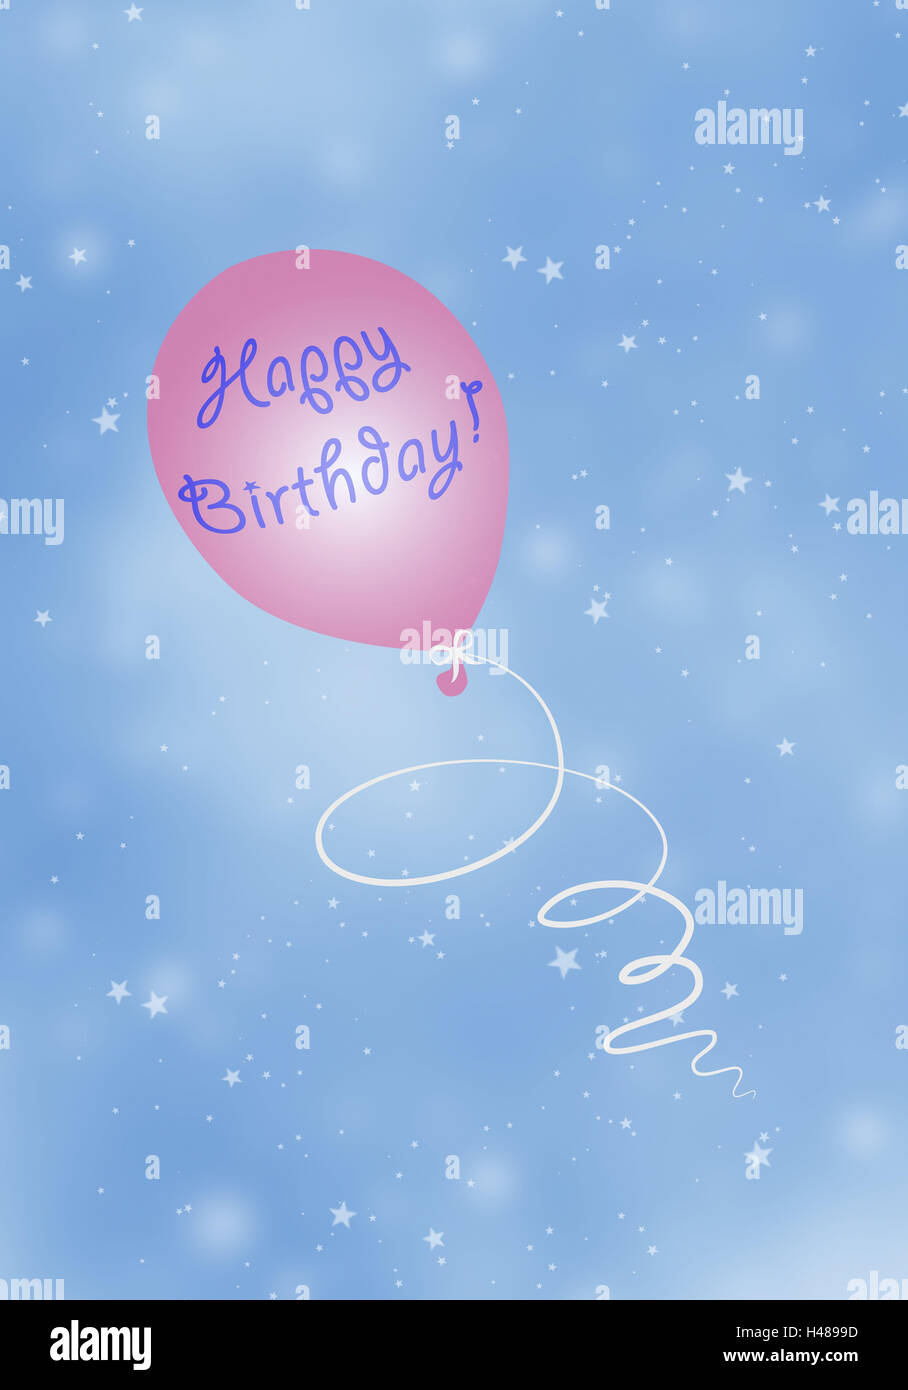 Illustration sky balloon fly float happy birthday graphics illustration sky balloon fly float happy birthday graphics balloon icon congratulations felicitation birthday birthday greetings colours m4hsunfo